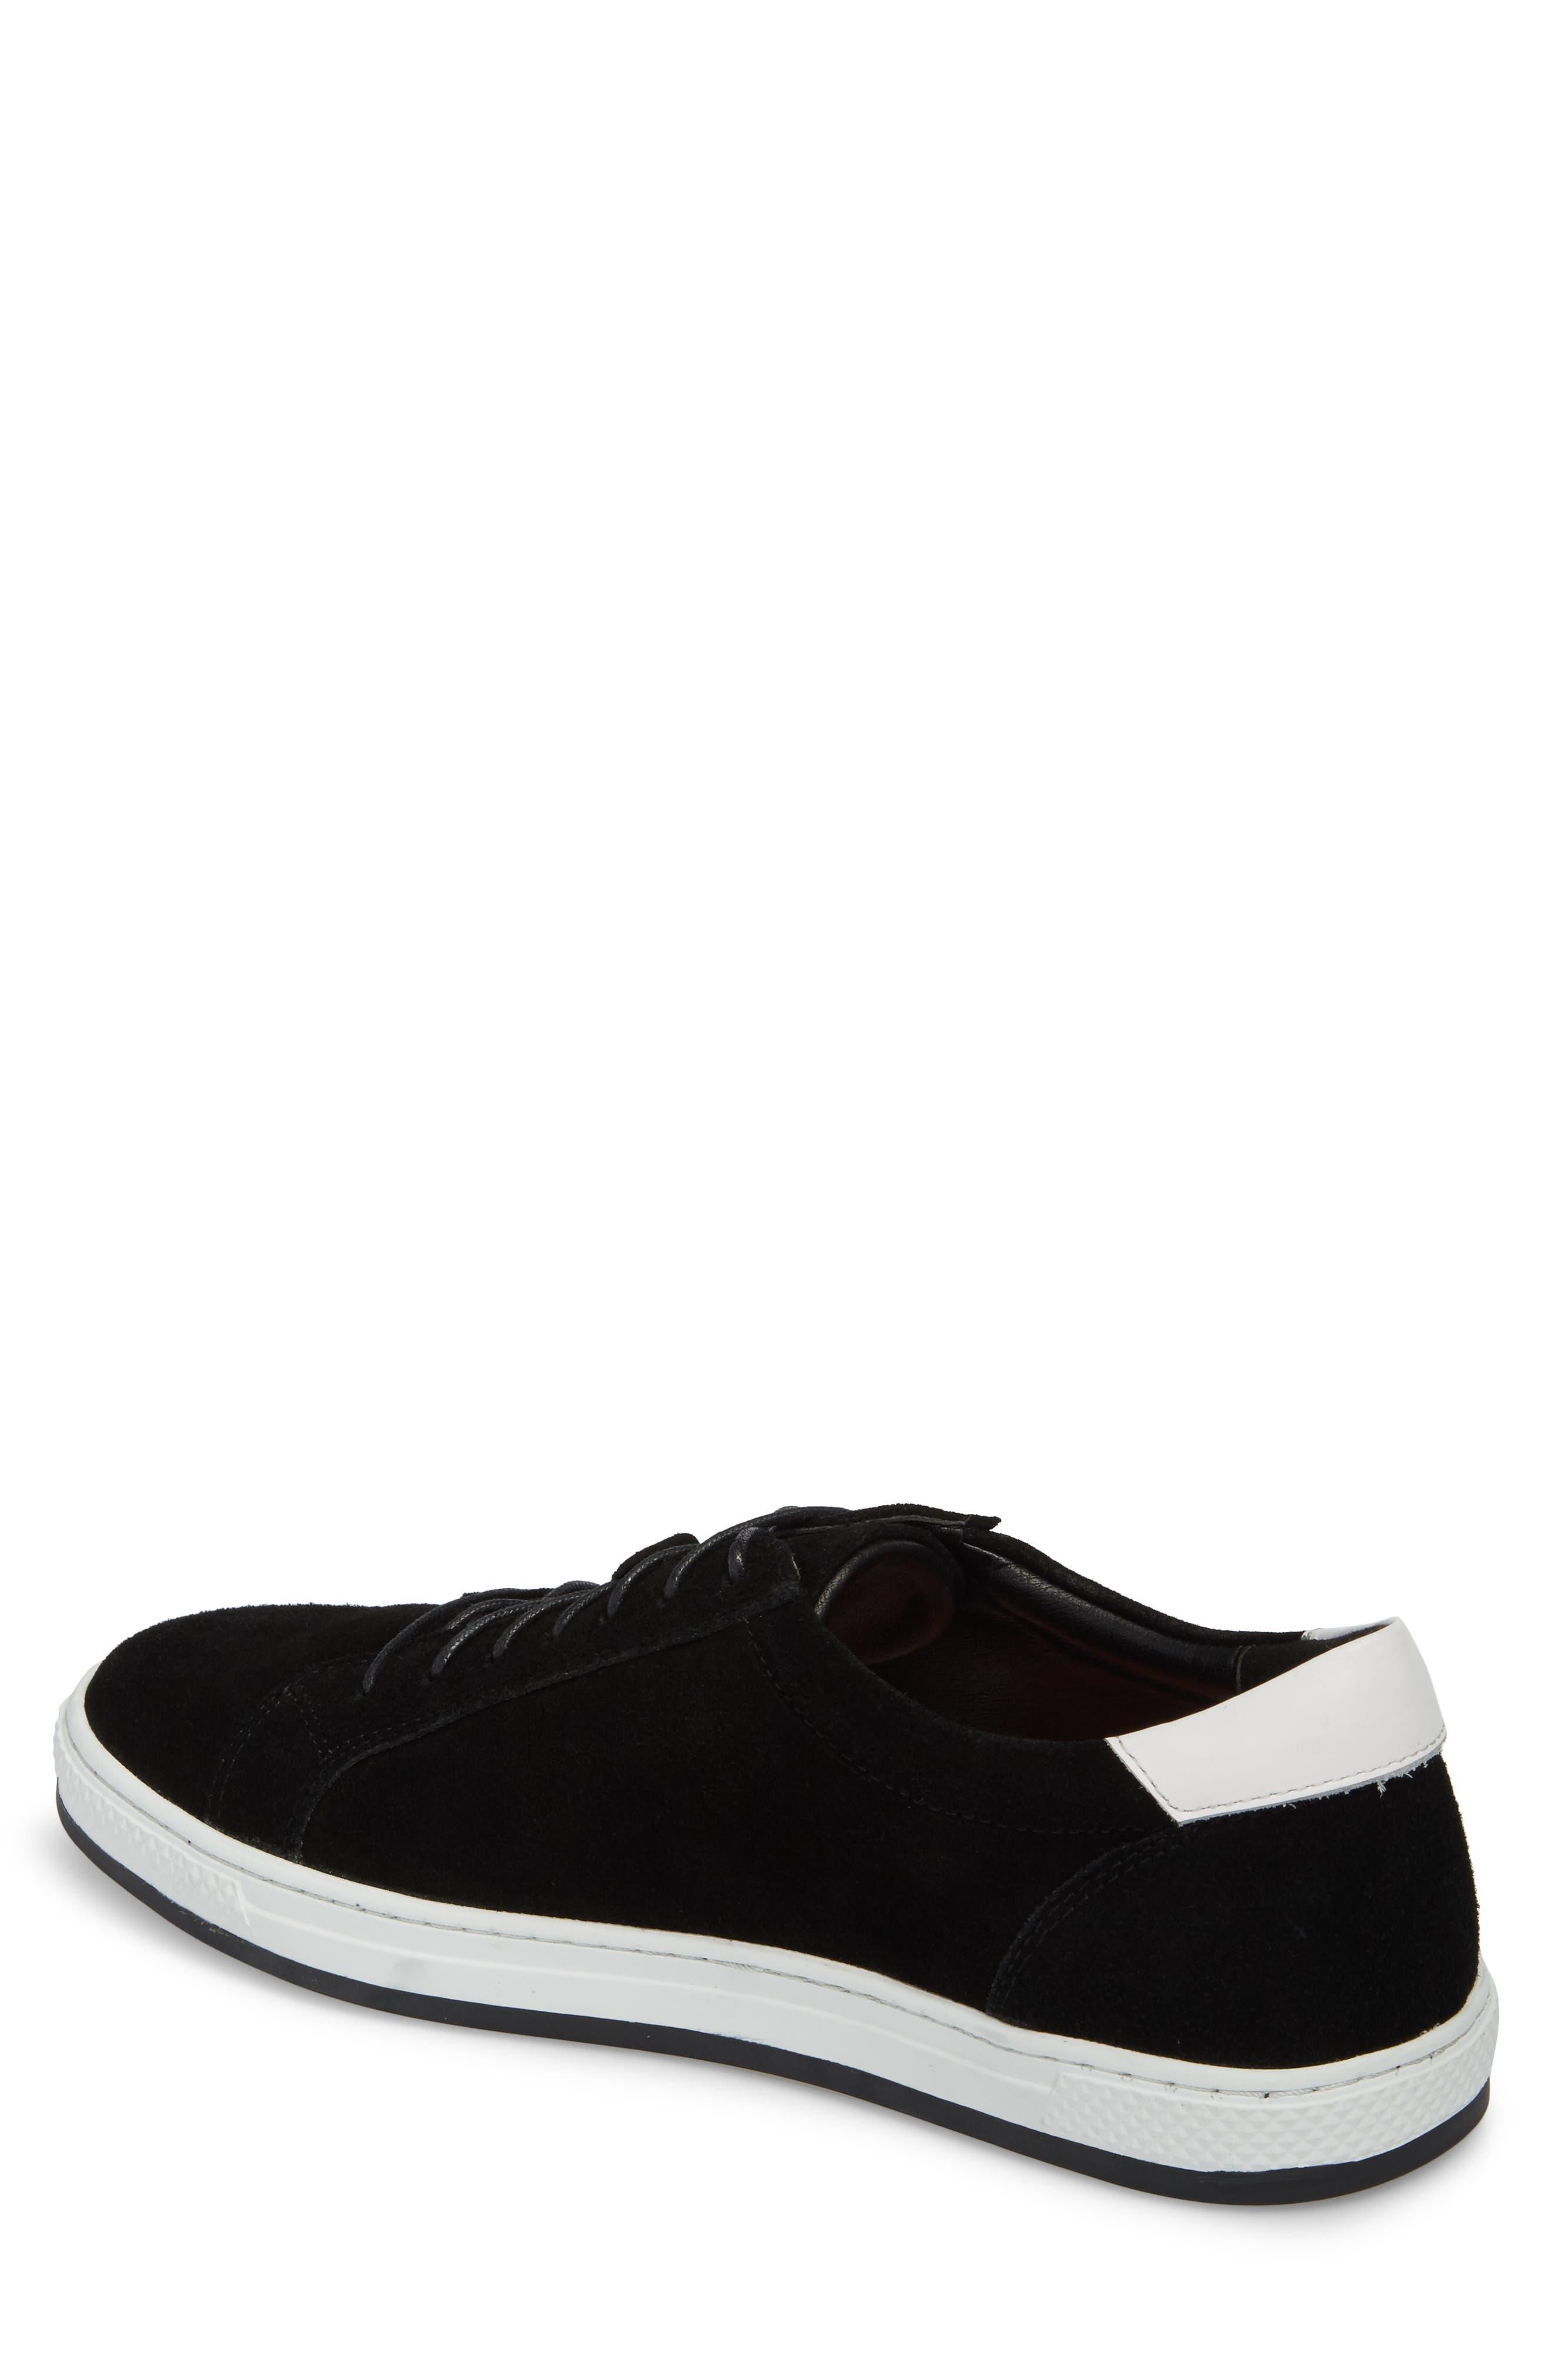 Queens Sneaker,                             Alternate thumbnail 2, color,                             001